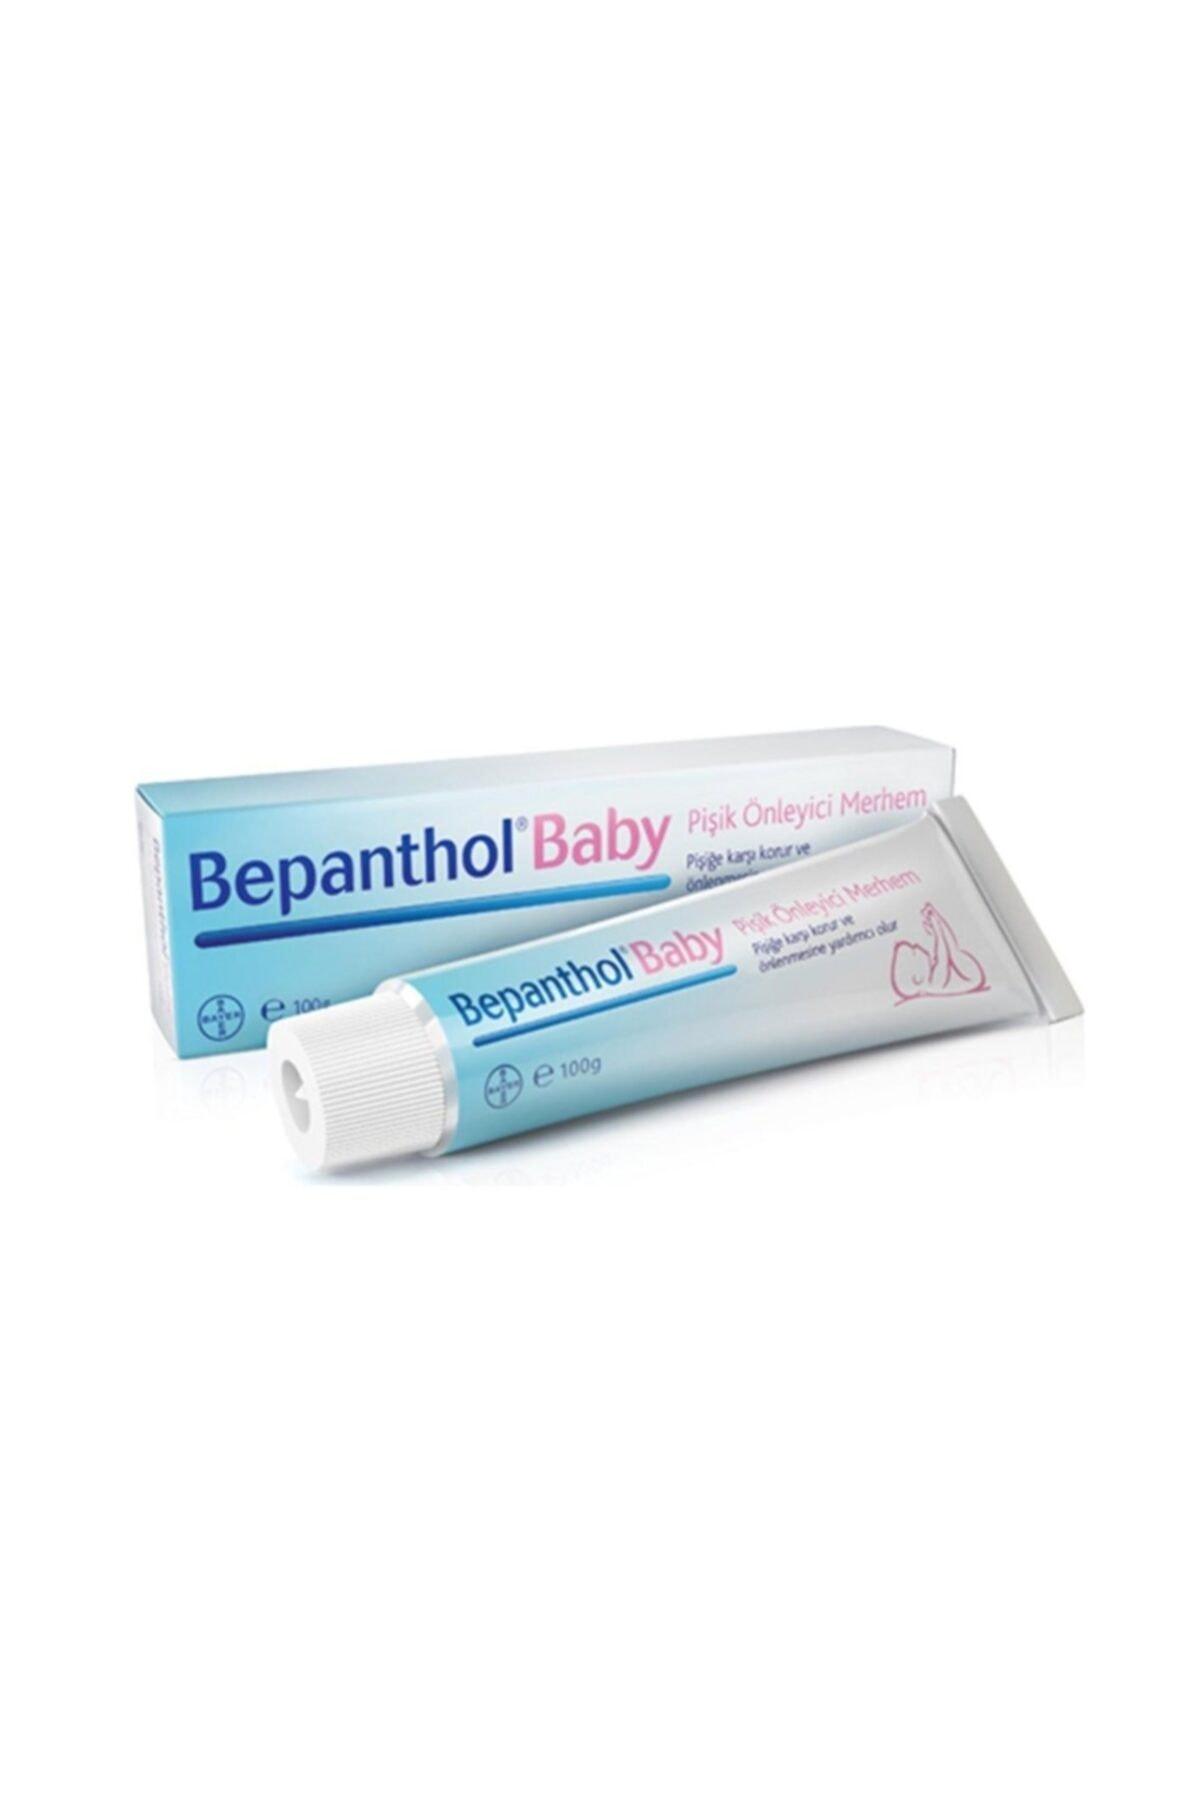 Bepanthol Baby Pişik Önleyici Merhem 30g 1